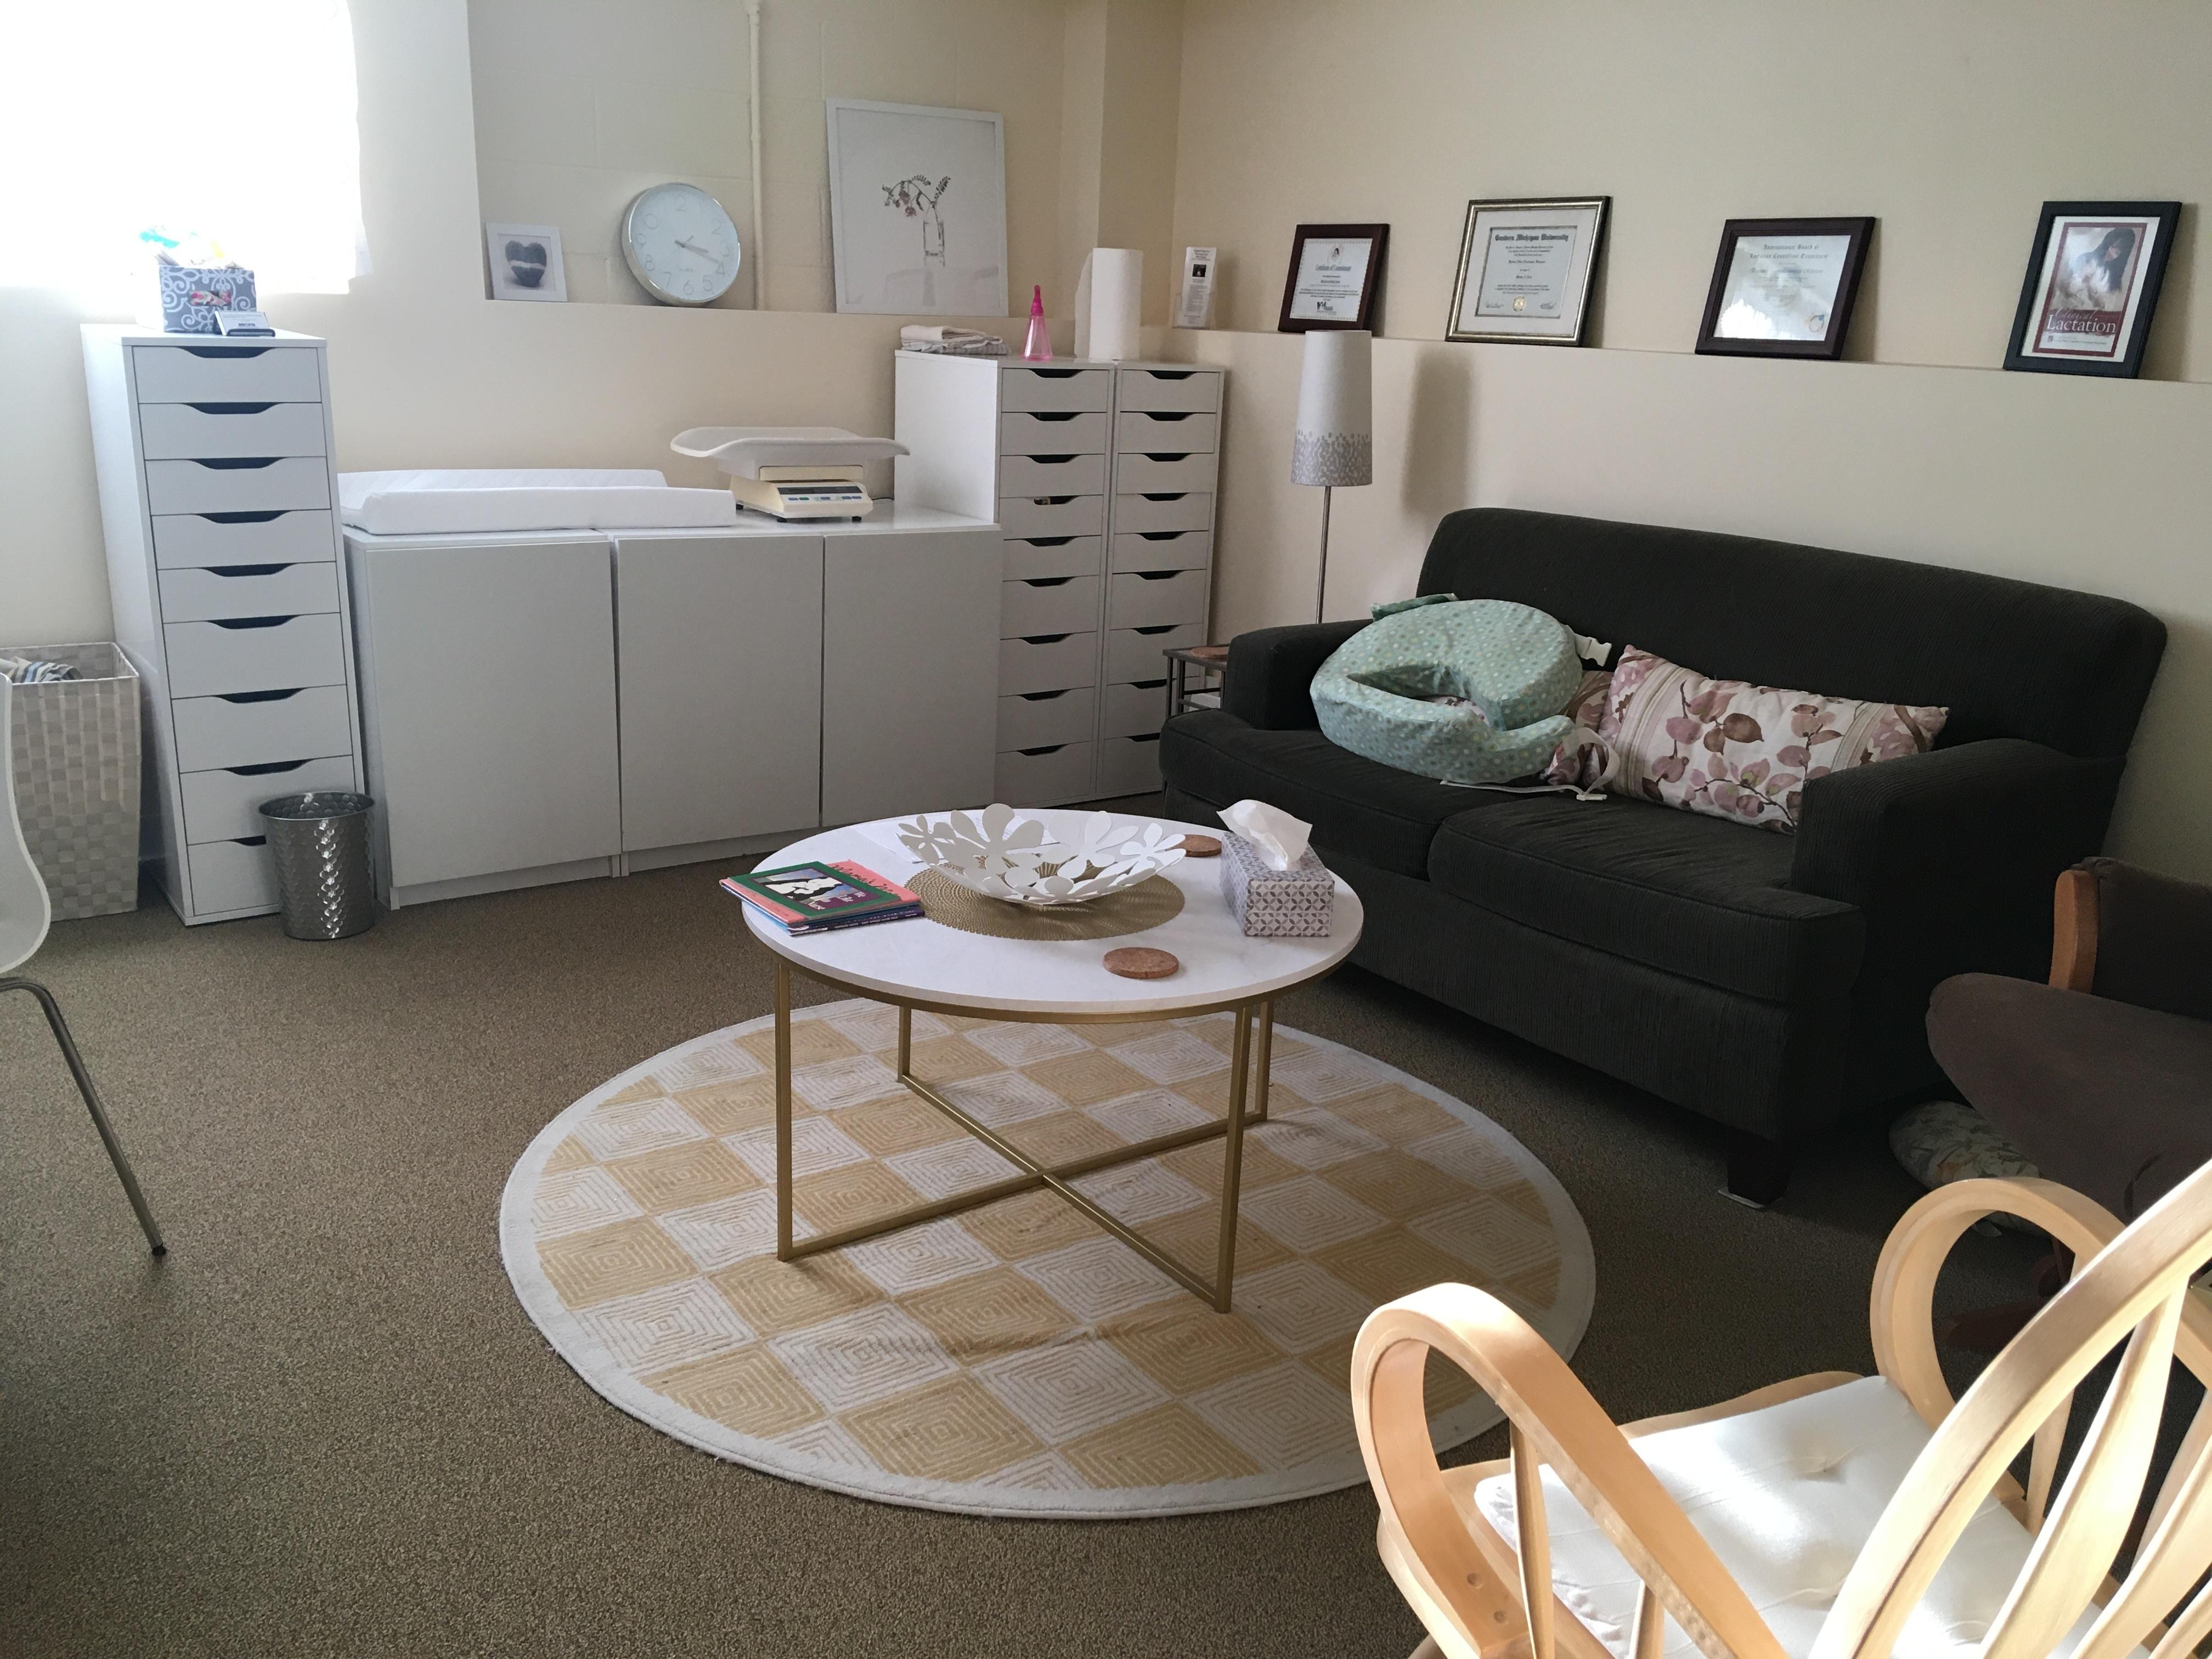 The Breastfeeding Center of Ann Arobr